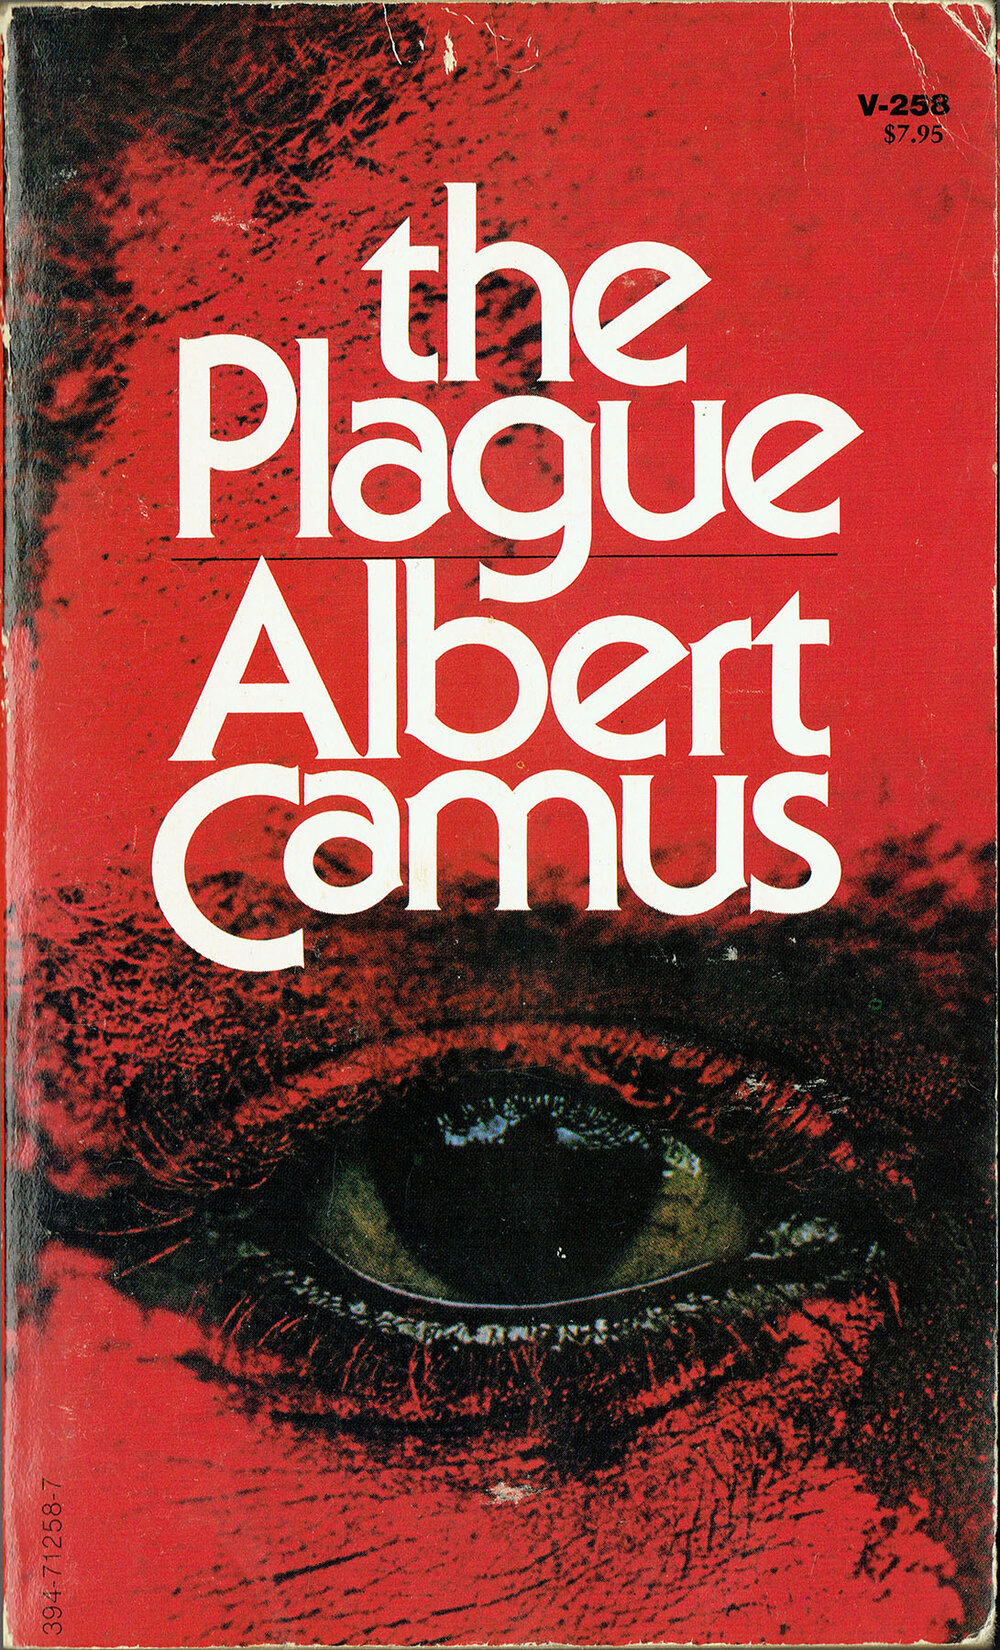 The Plague, Albert Camus, 70s Book Cover